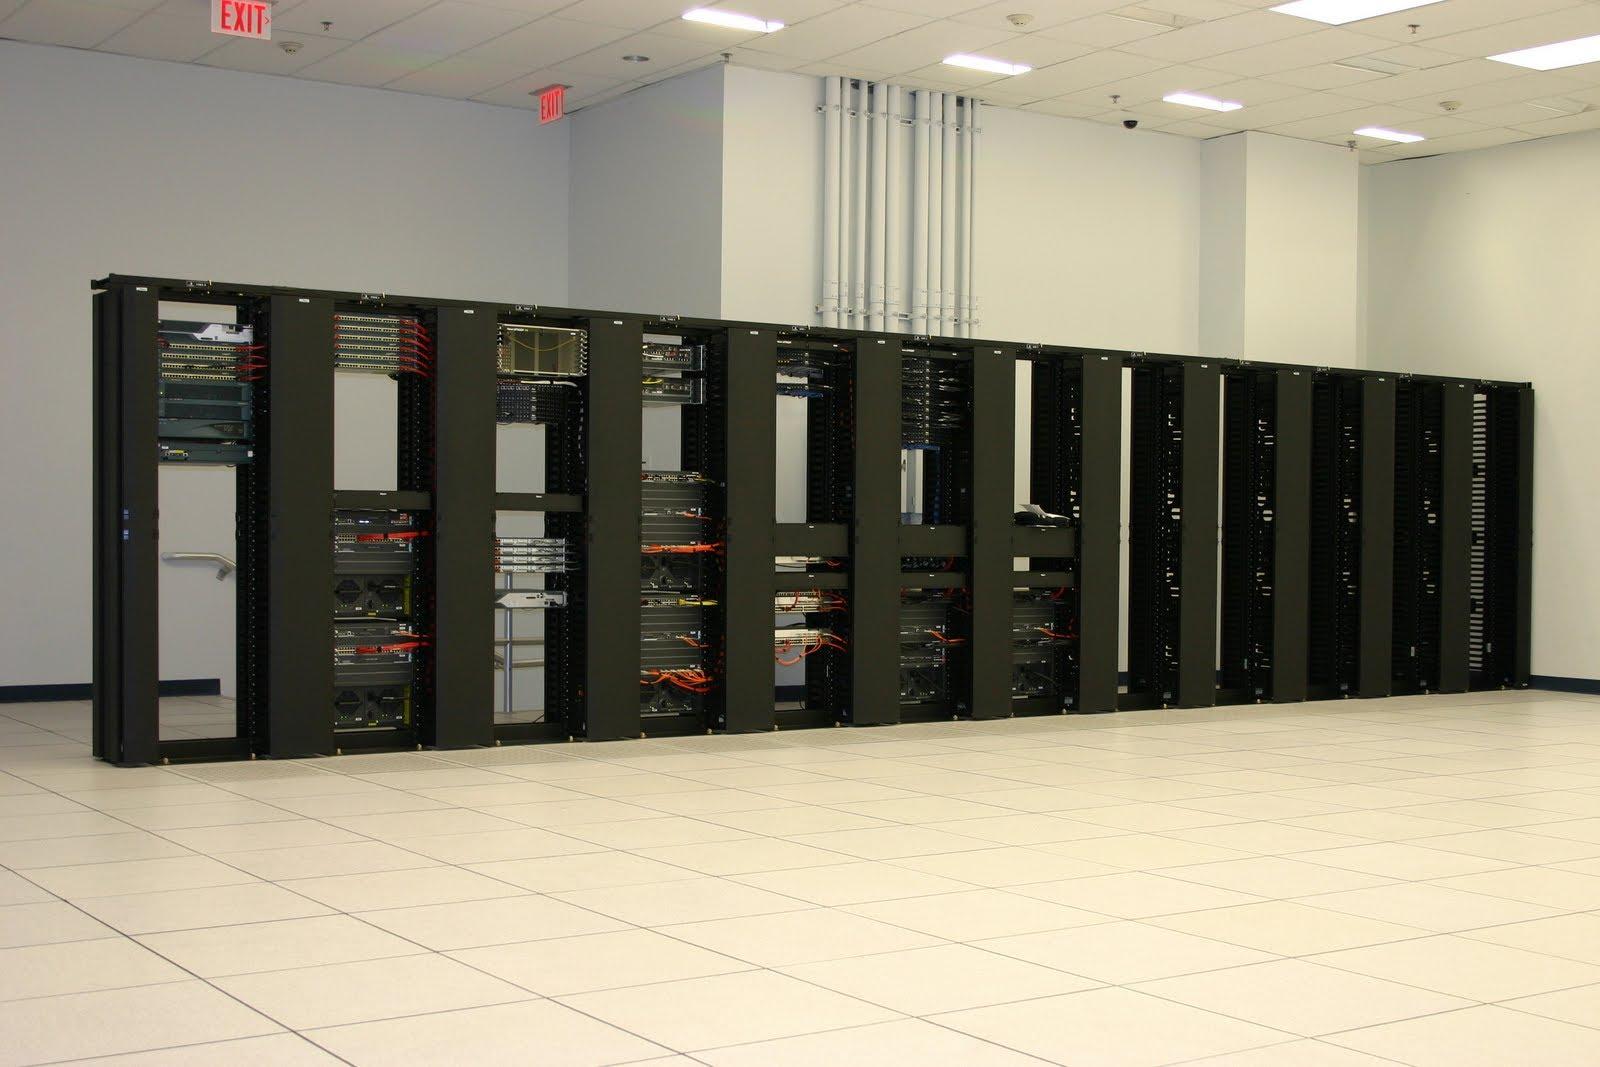 https://sites.google.com/a/locals.best/locals-best/california/los-angeles/data-cabling